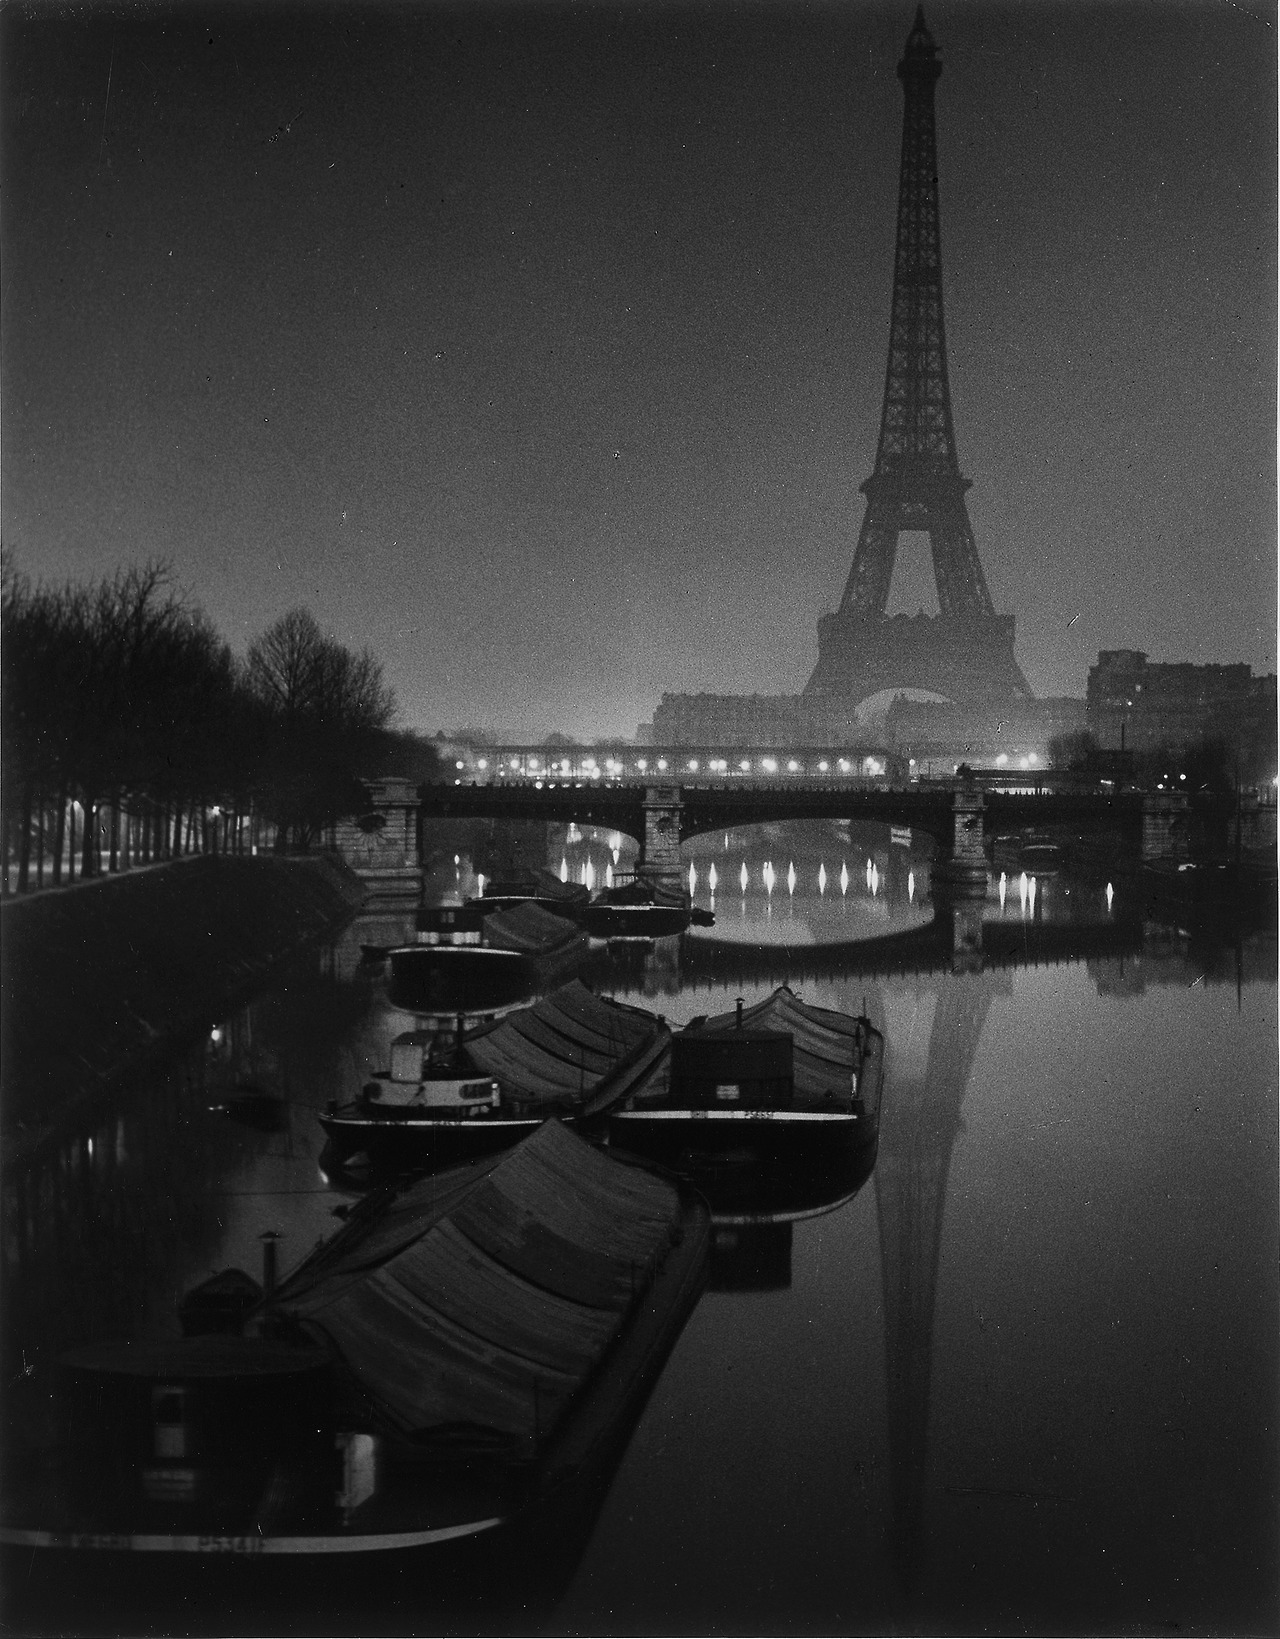 The-Eiffel-Tower-at-Twilight-1932.jpg